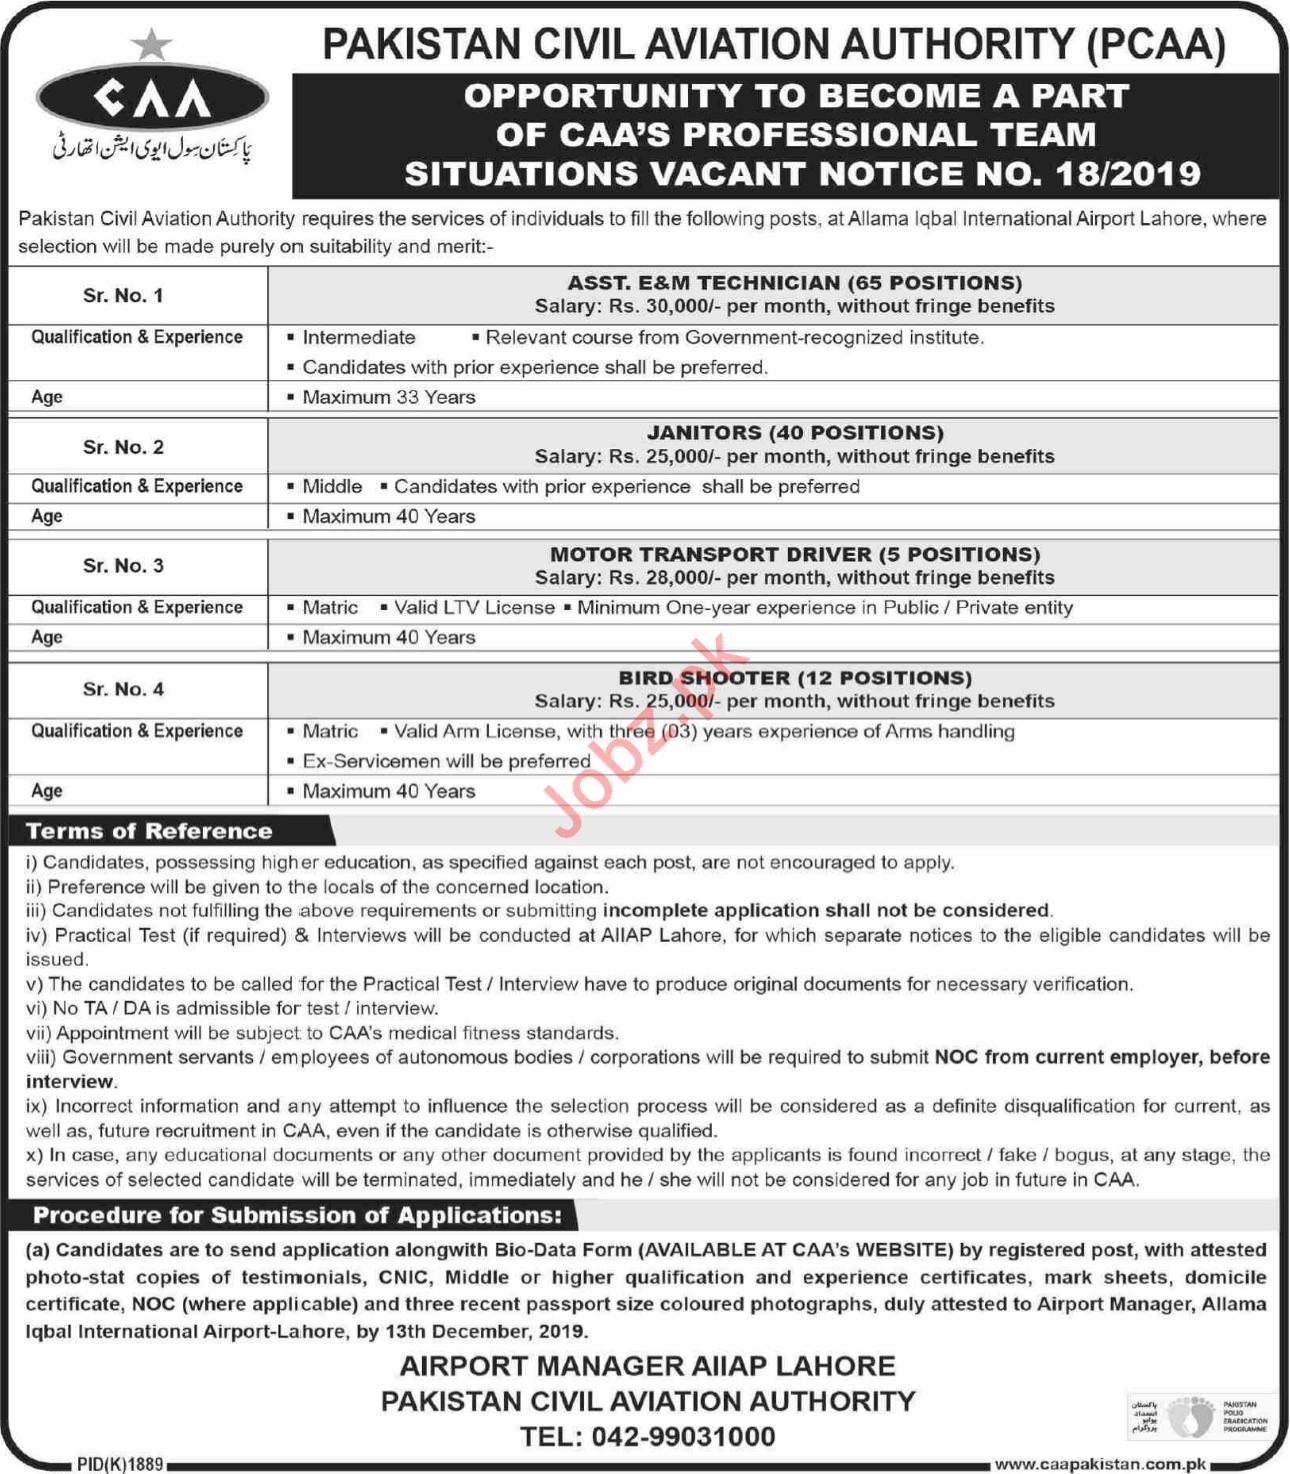 Allama Iqbal International Airport Lahore Jobs 2019